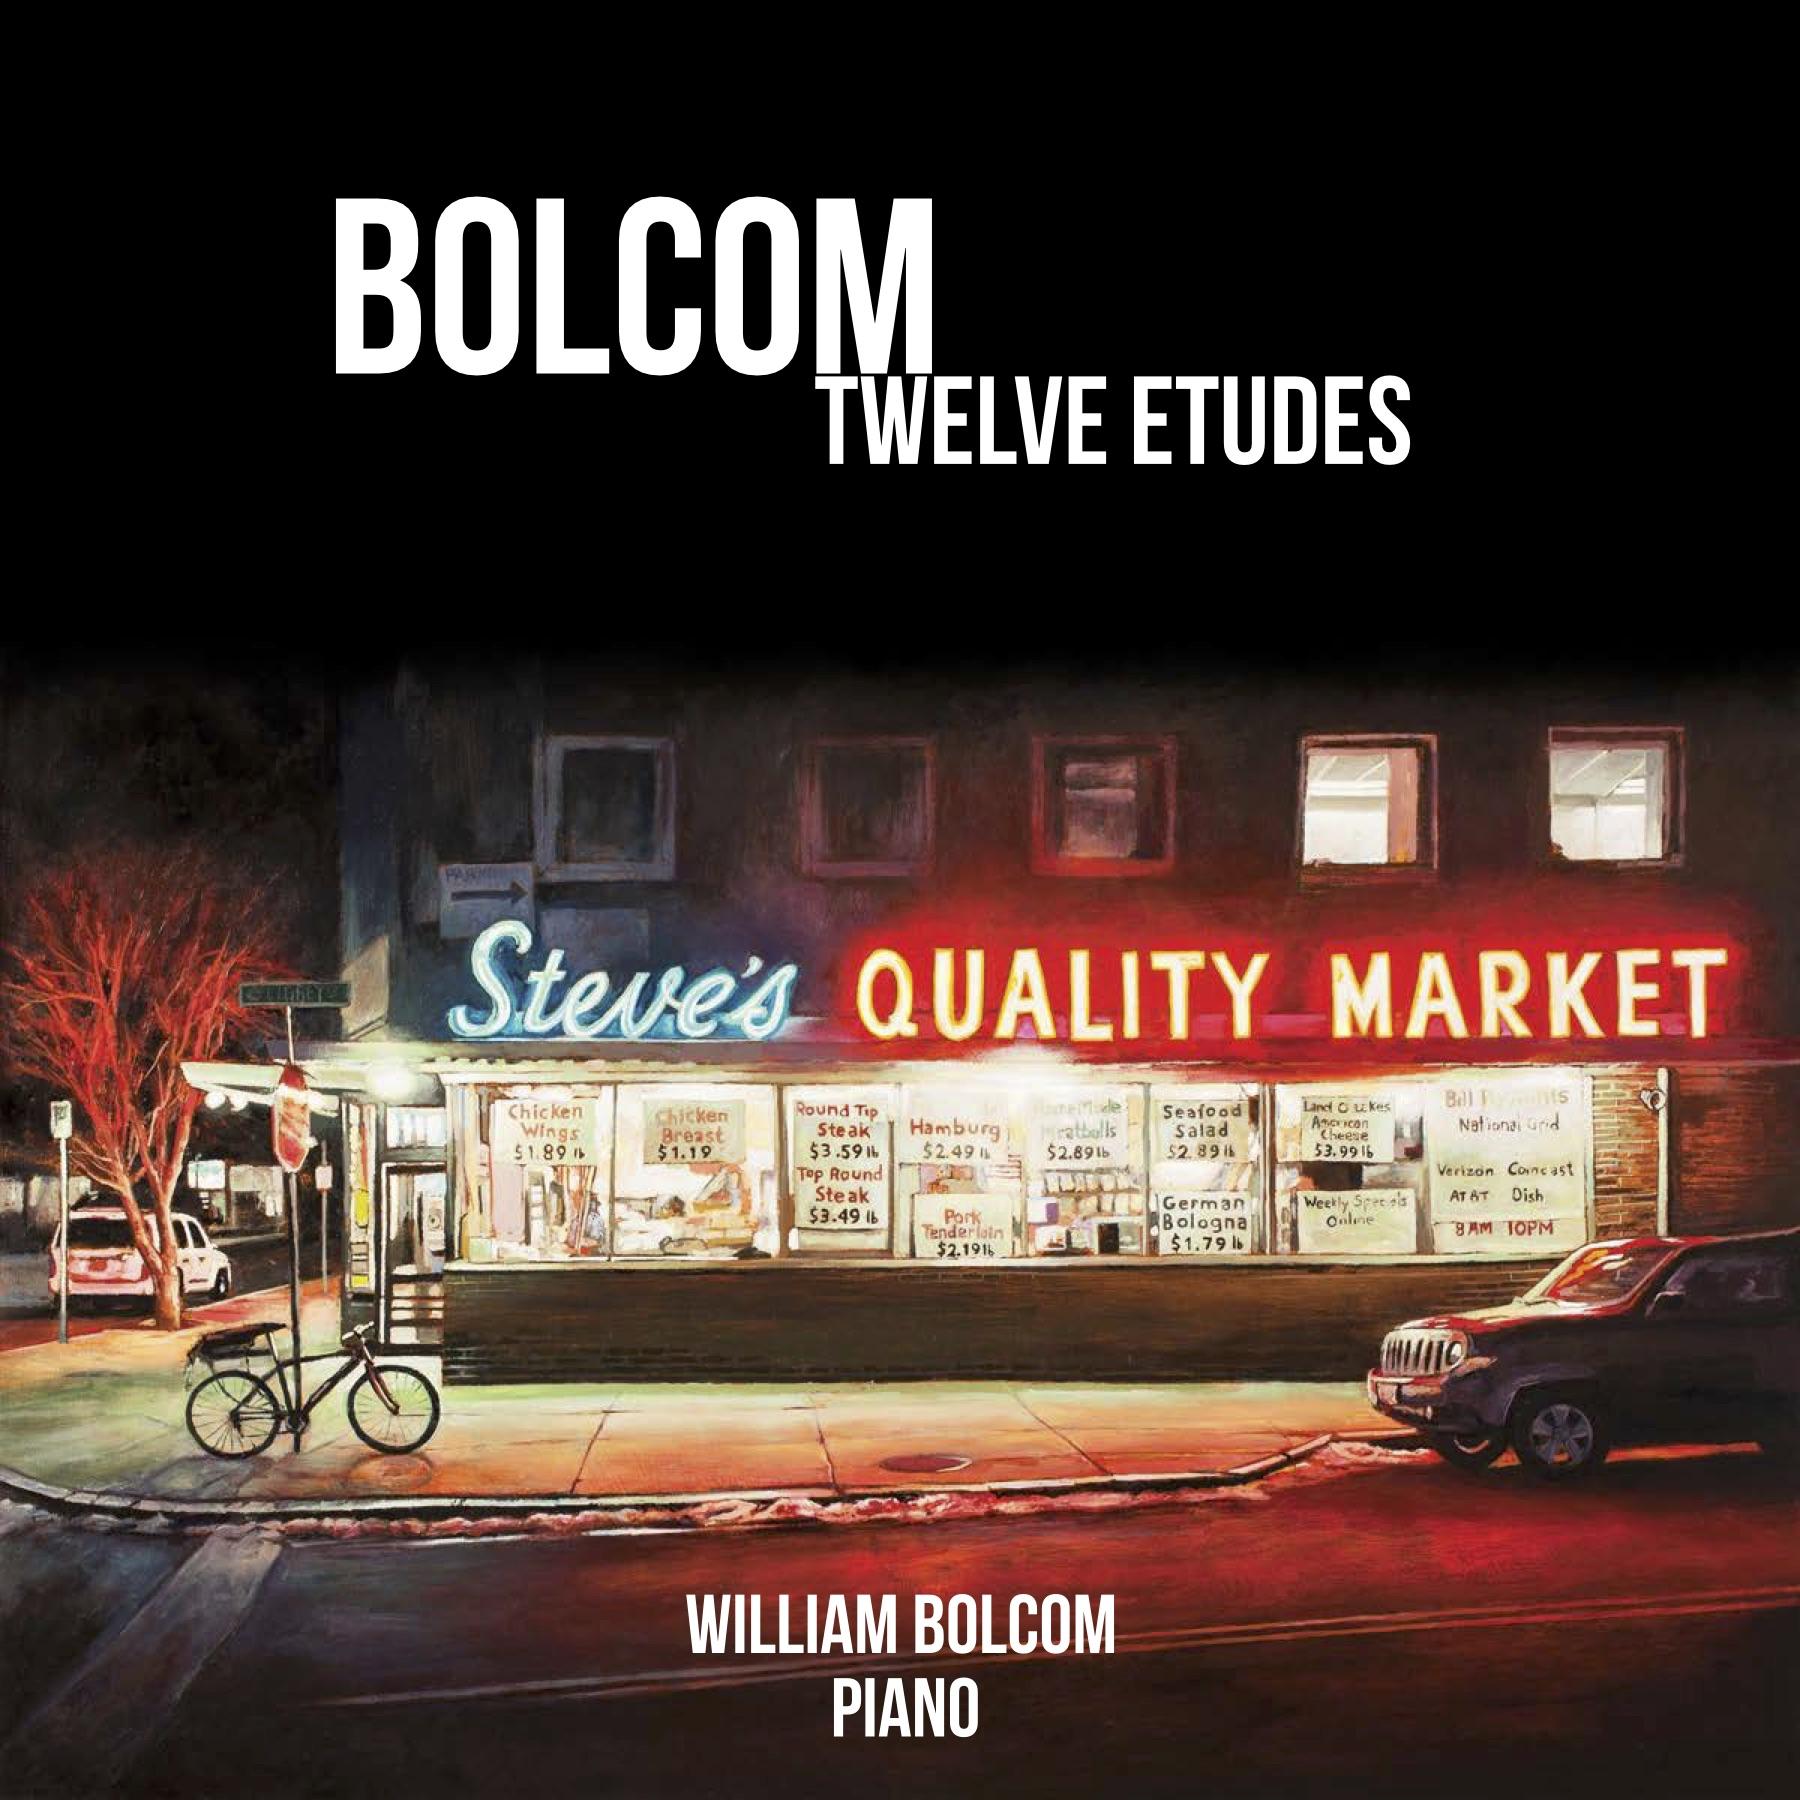 BOLCOM: TWELVE ETUDES